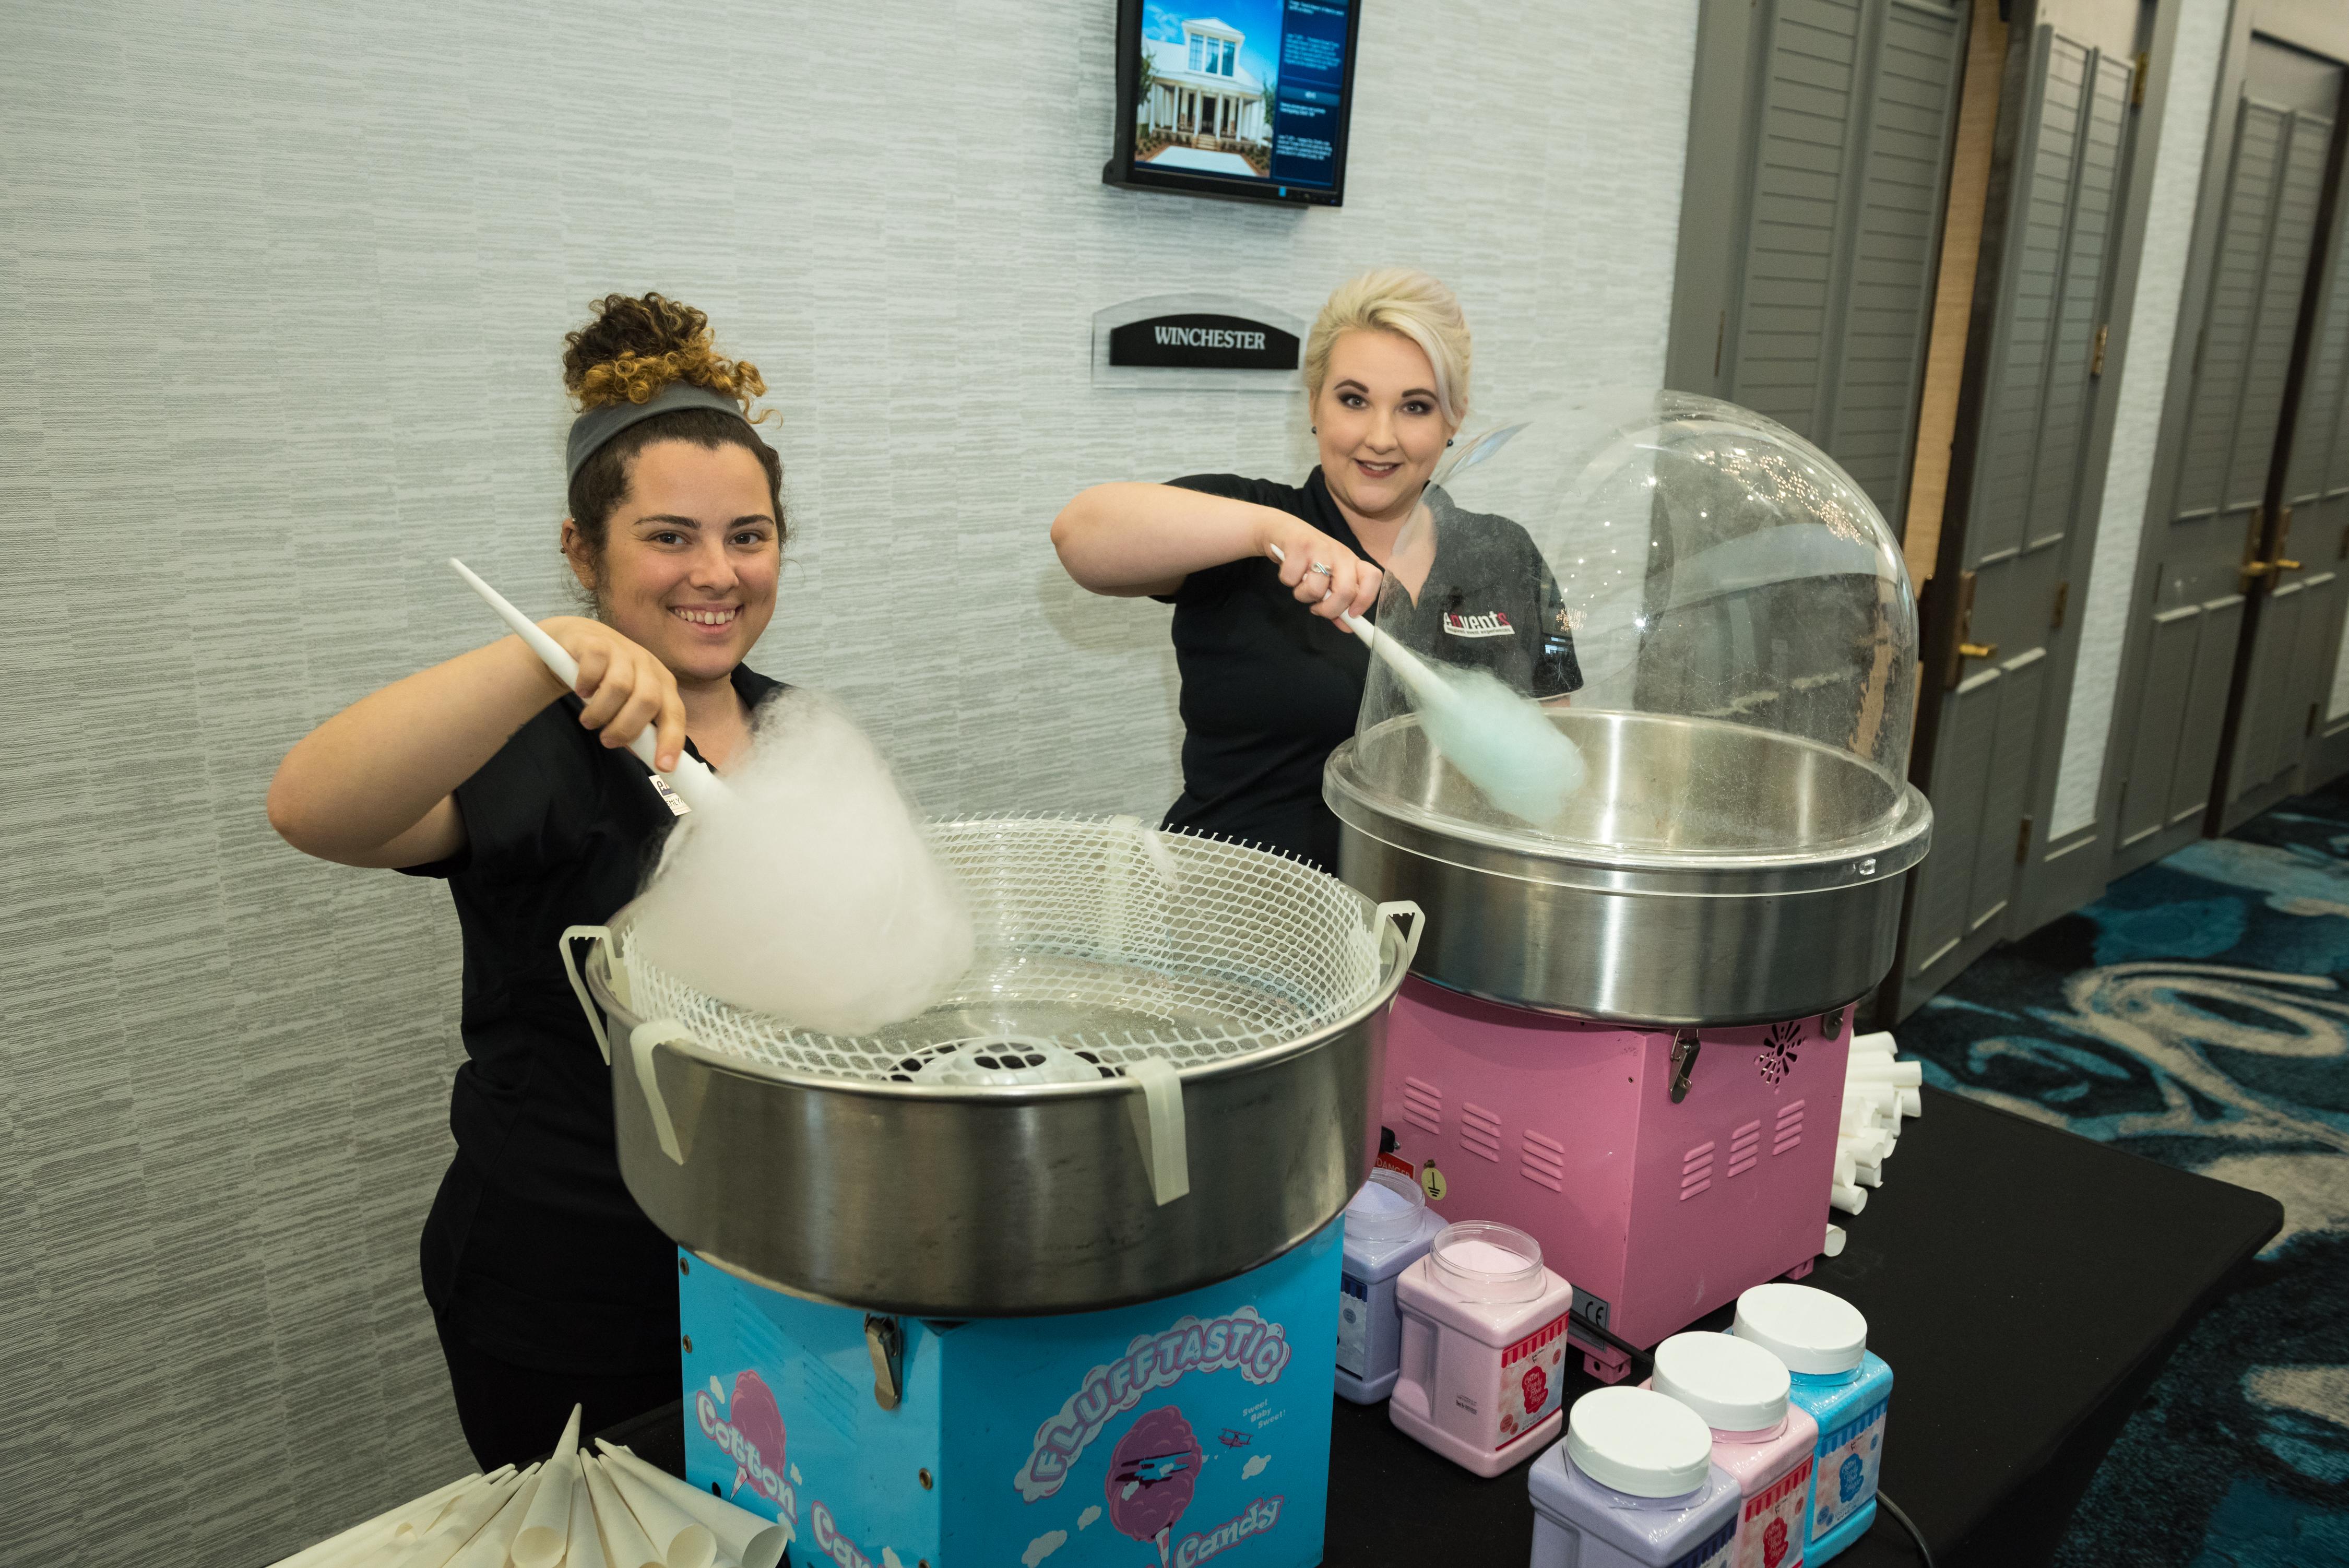 envents_cotton candy machine_team photos